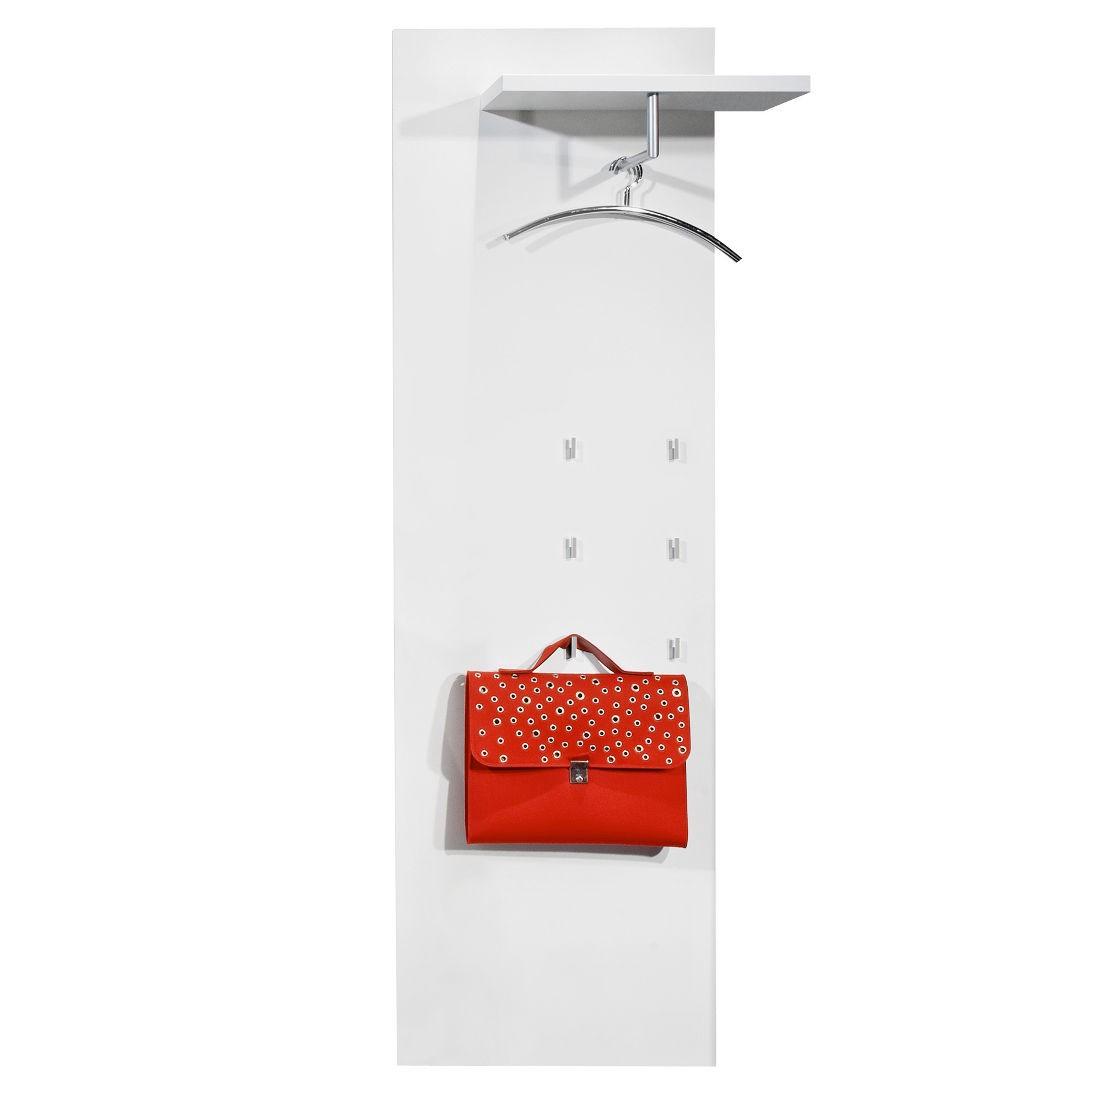 garderobe paneel arte m preisvergleiche. Black Bedroom Furniture Sets. Home Design Ideas